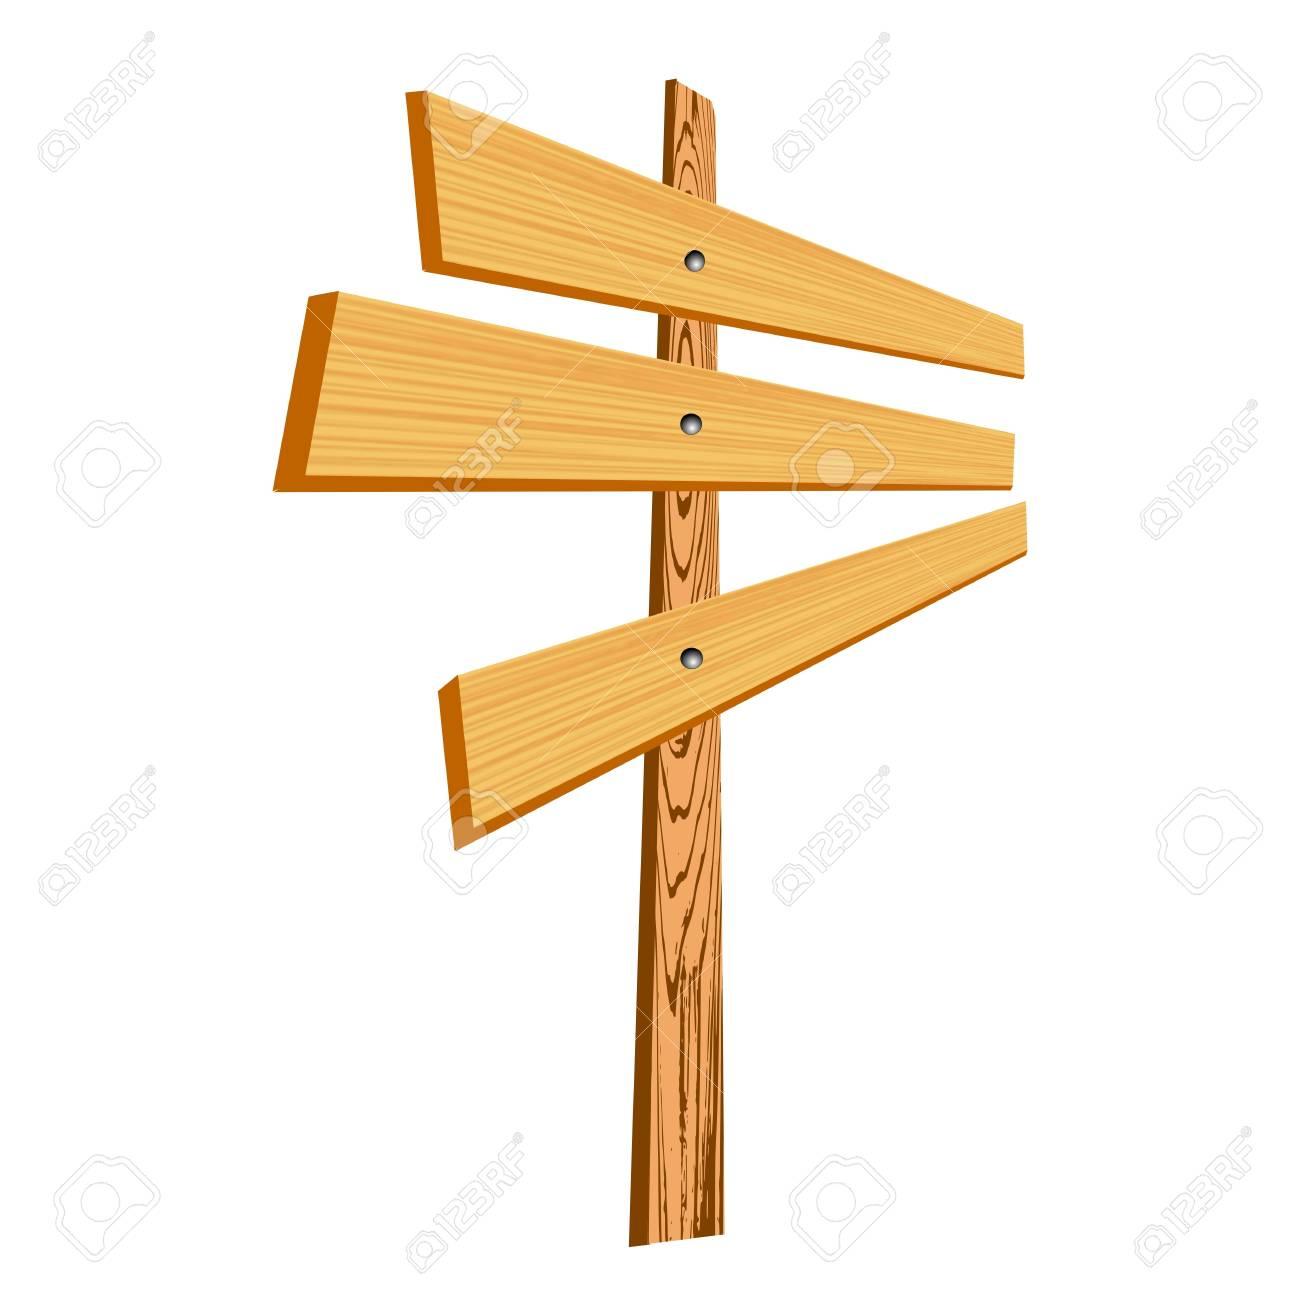 blank wooden sign - vector Stock Vector - 13285685